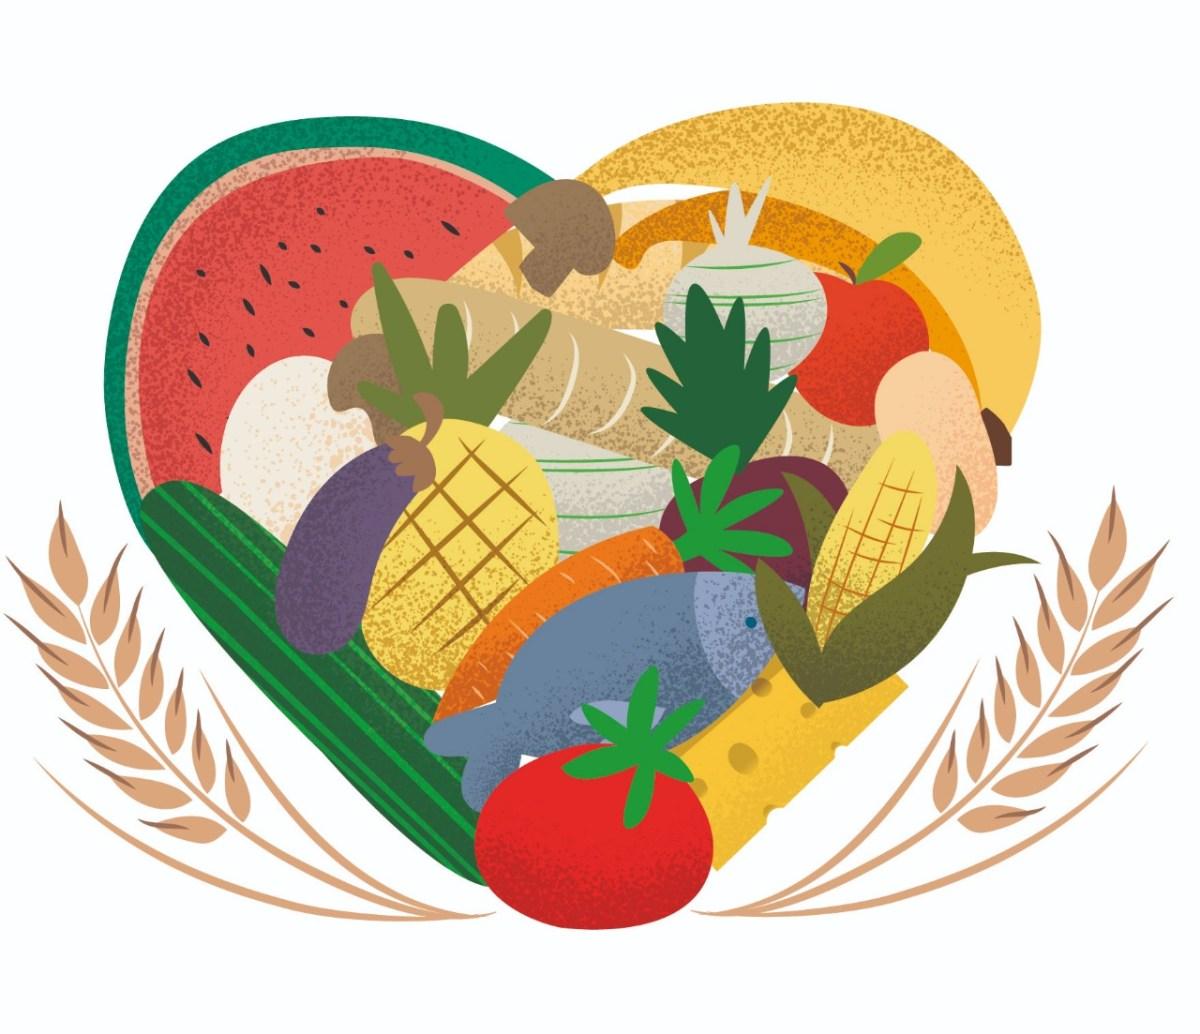 alimentacion saludable para prevenir enfermedades cronicas